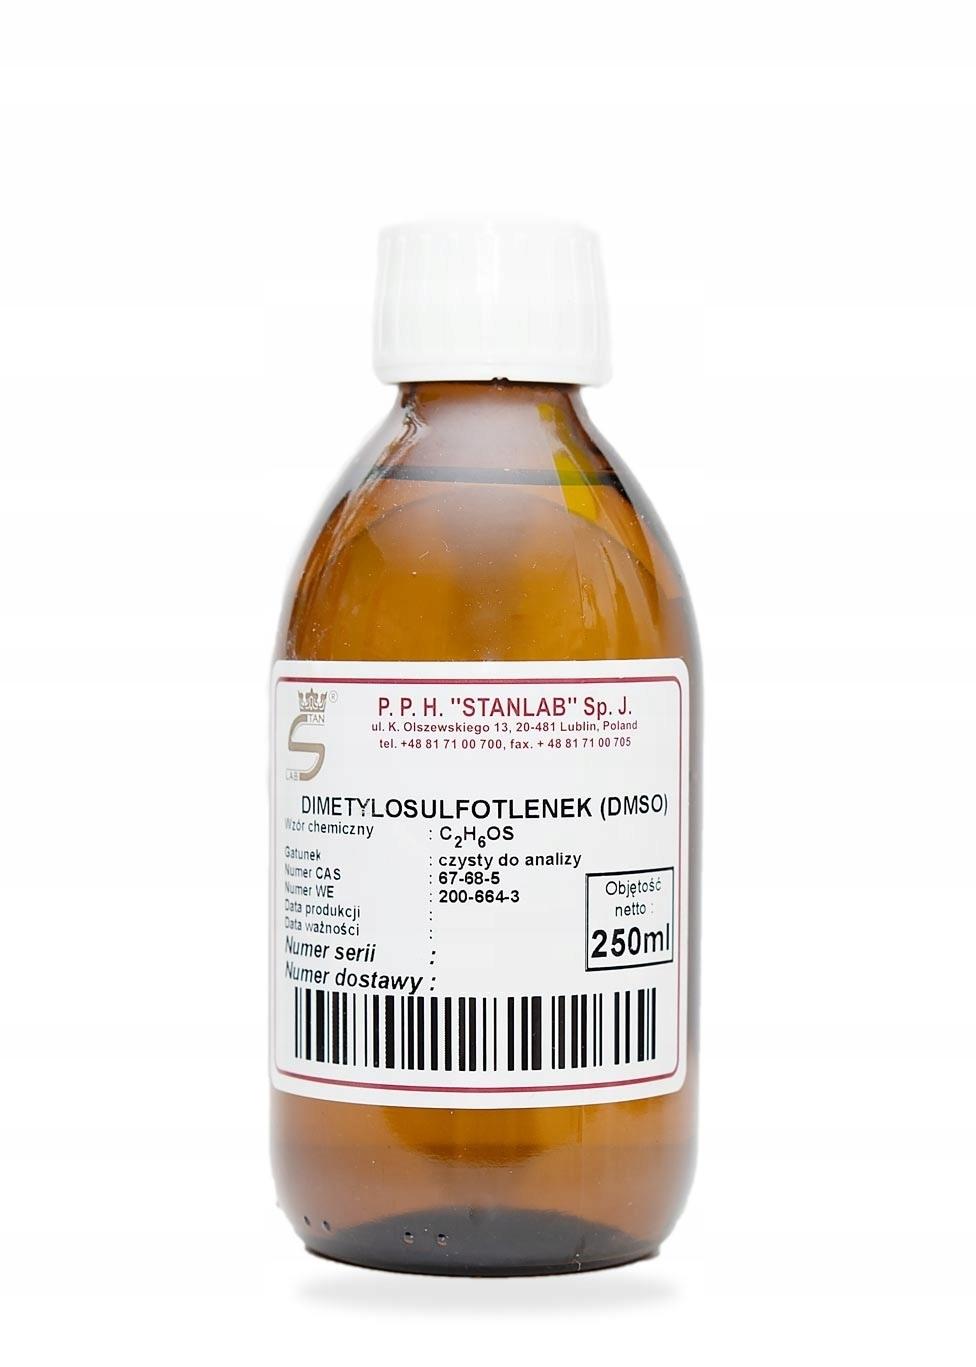 DMSO Dimetylosulfotlenek Stanlab CZDA 250ml